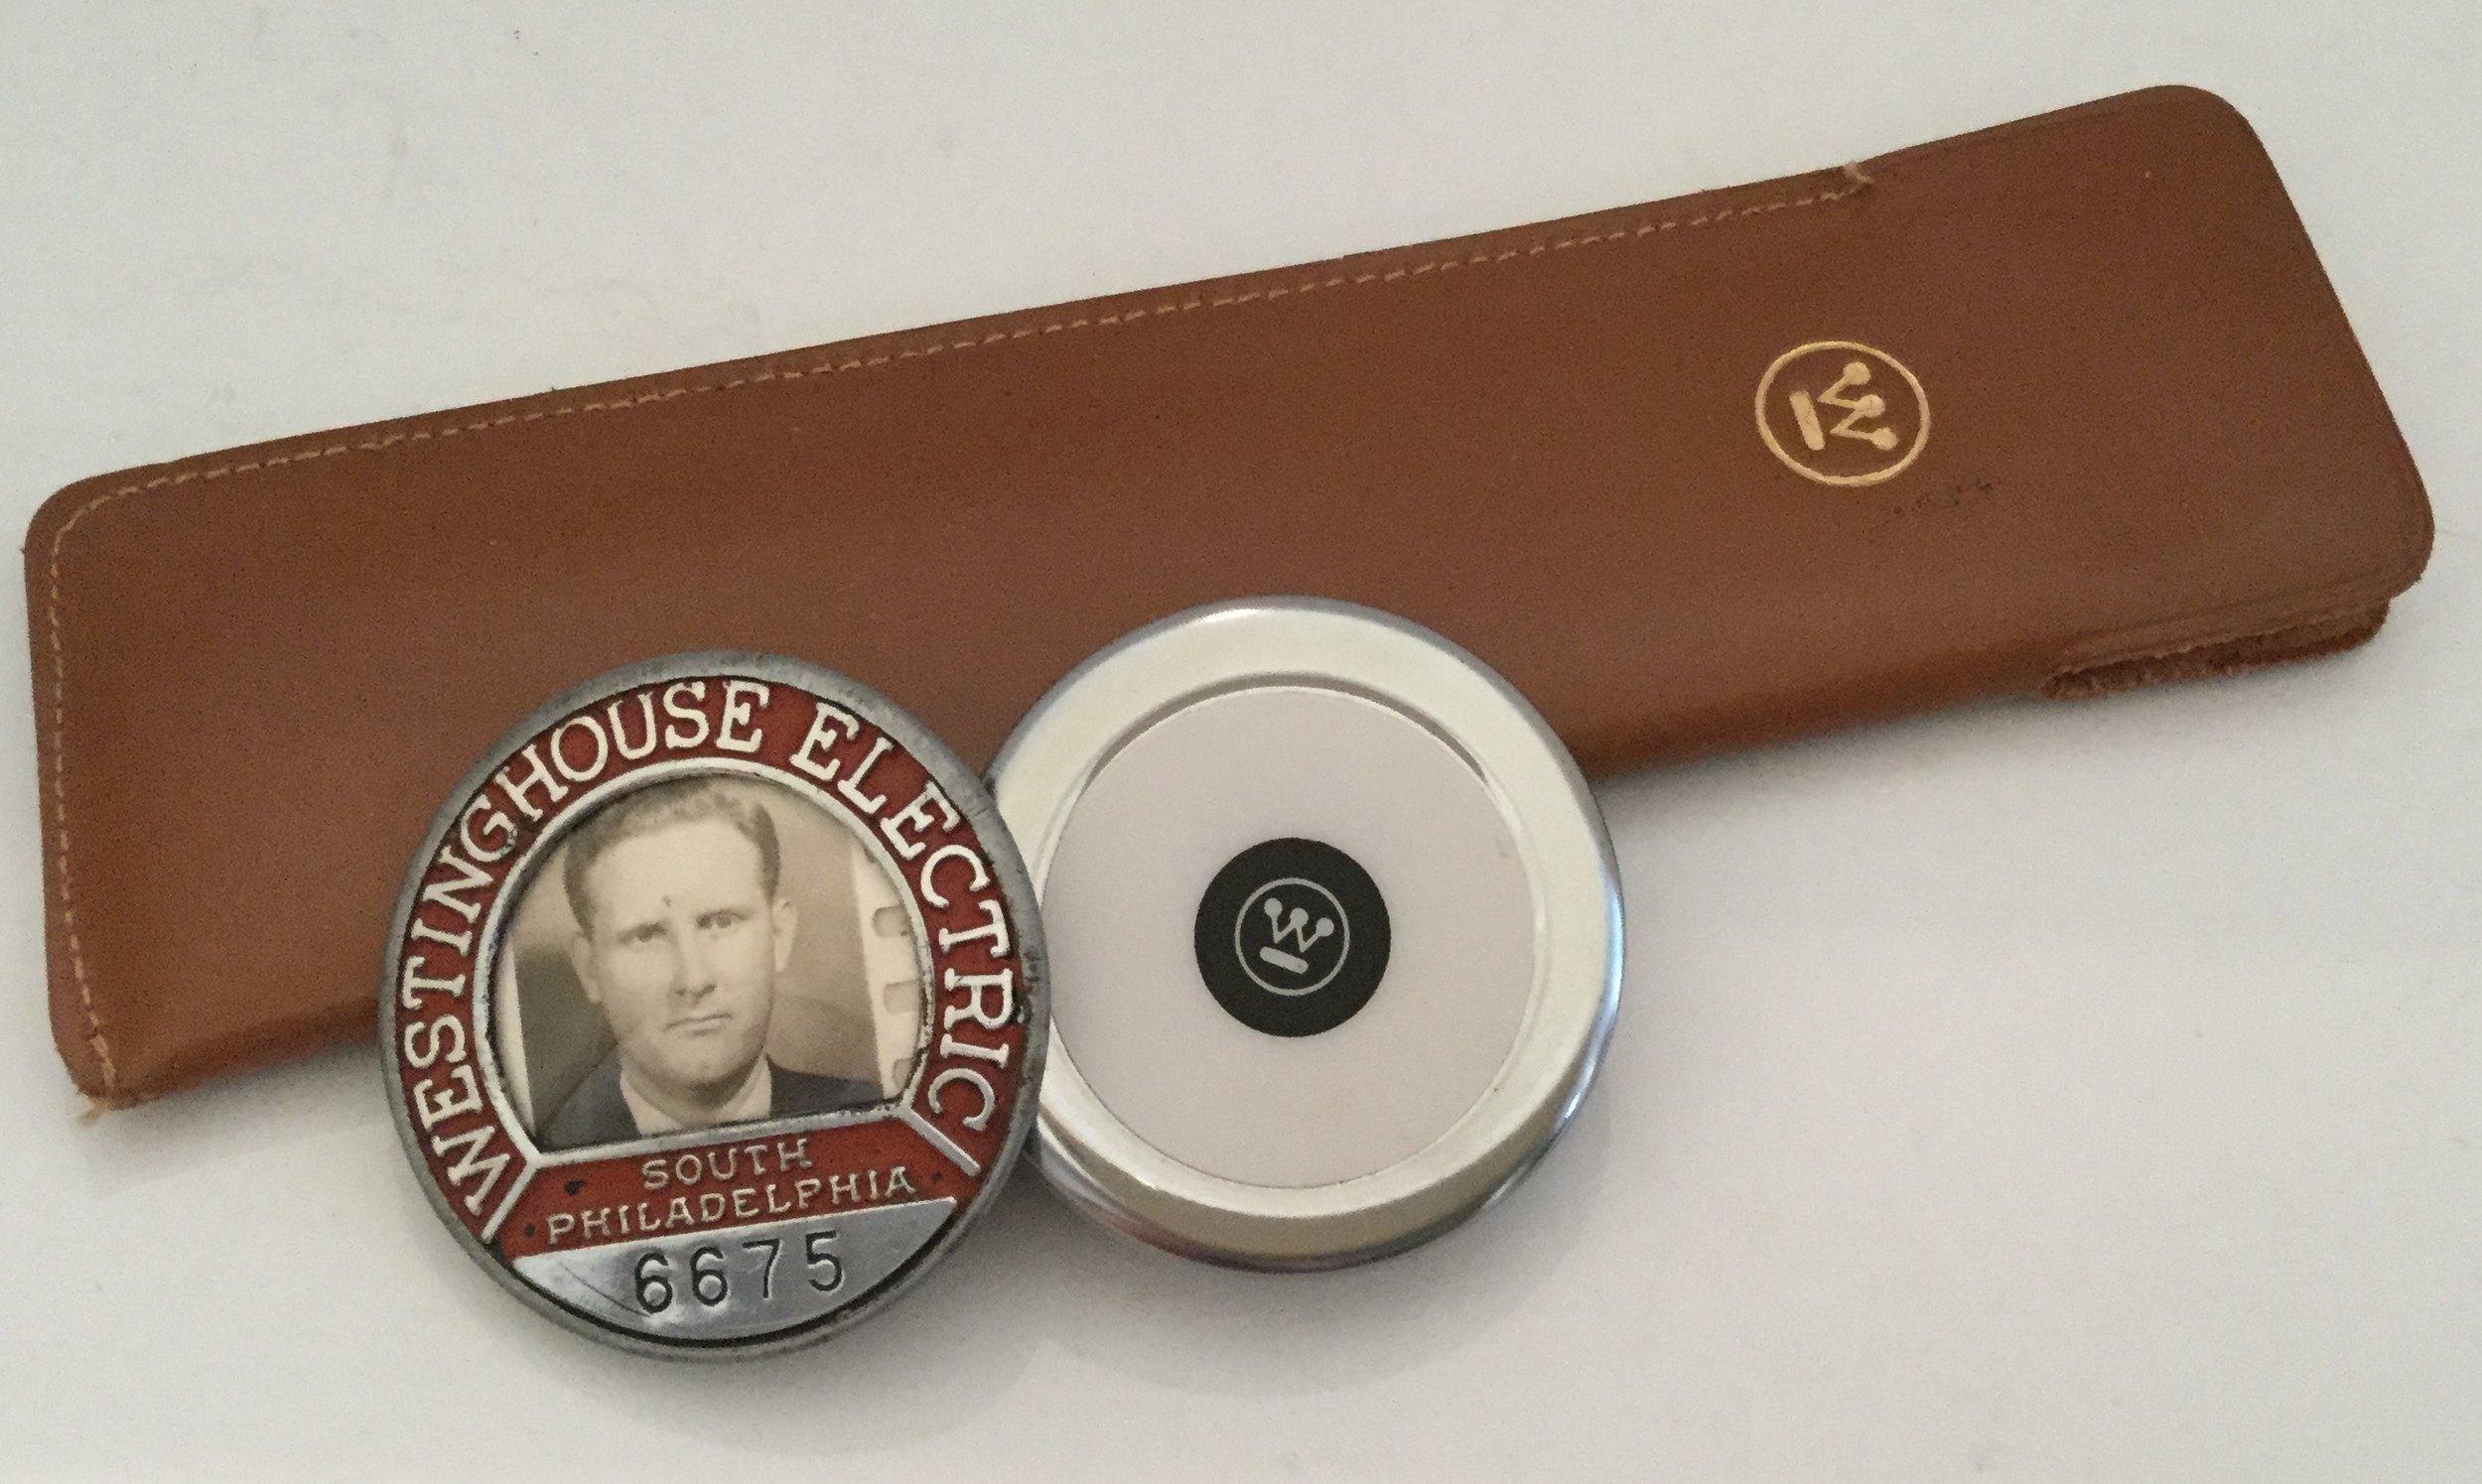 Slide rule, tape measure, and employee badge belonging to my dad